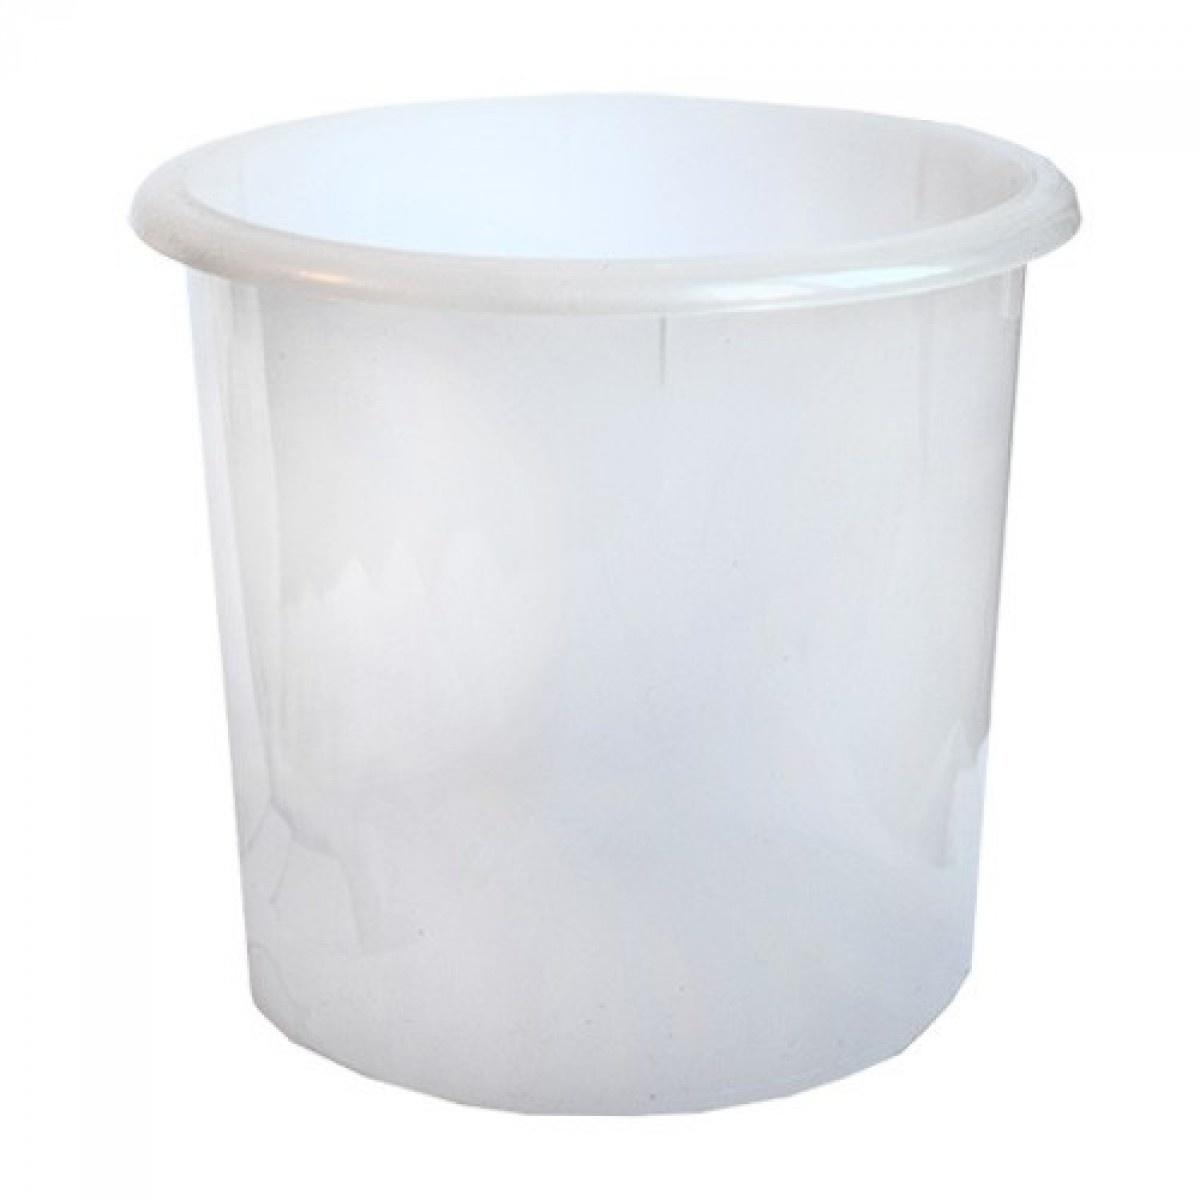 Plastic inzetbeker 2,5 L Plastic inzetbeker 2,5 L